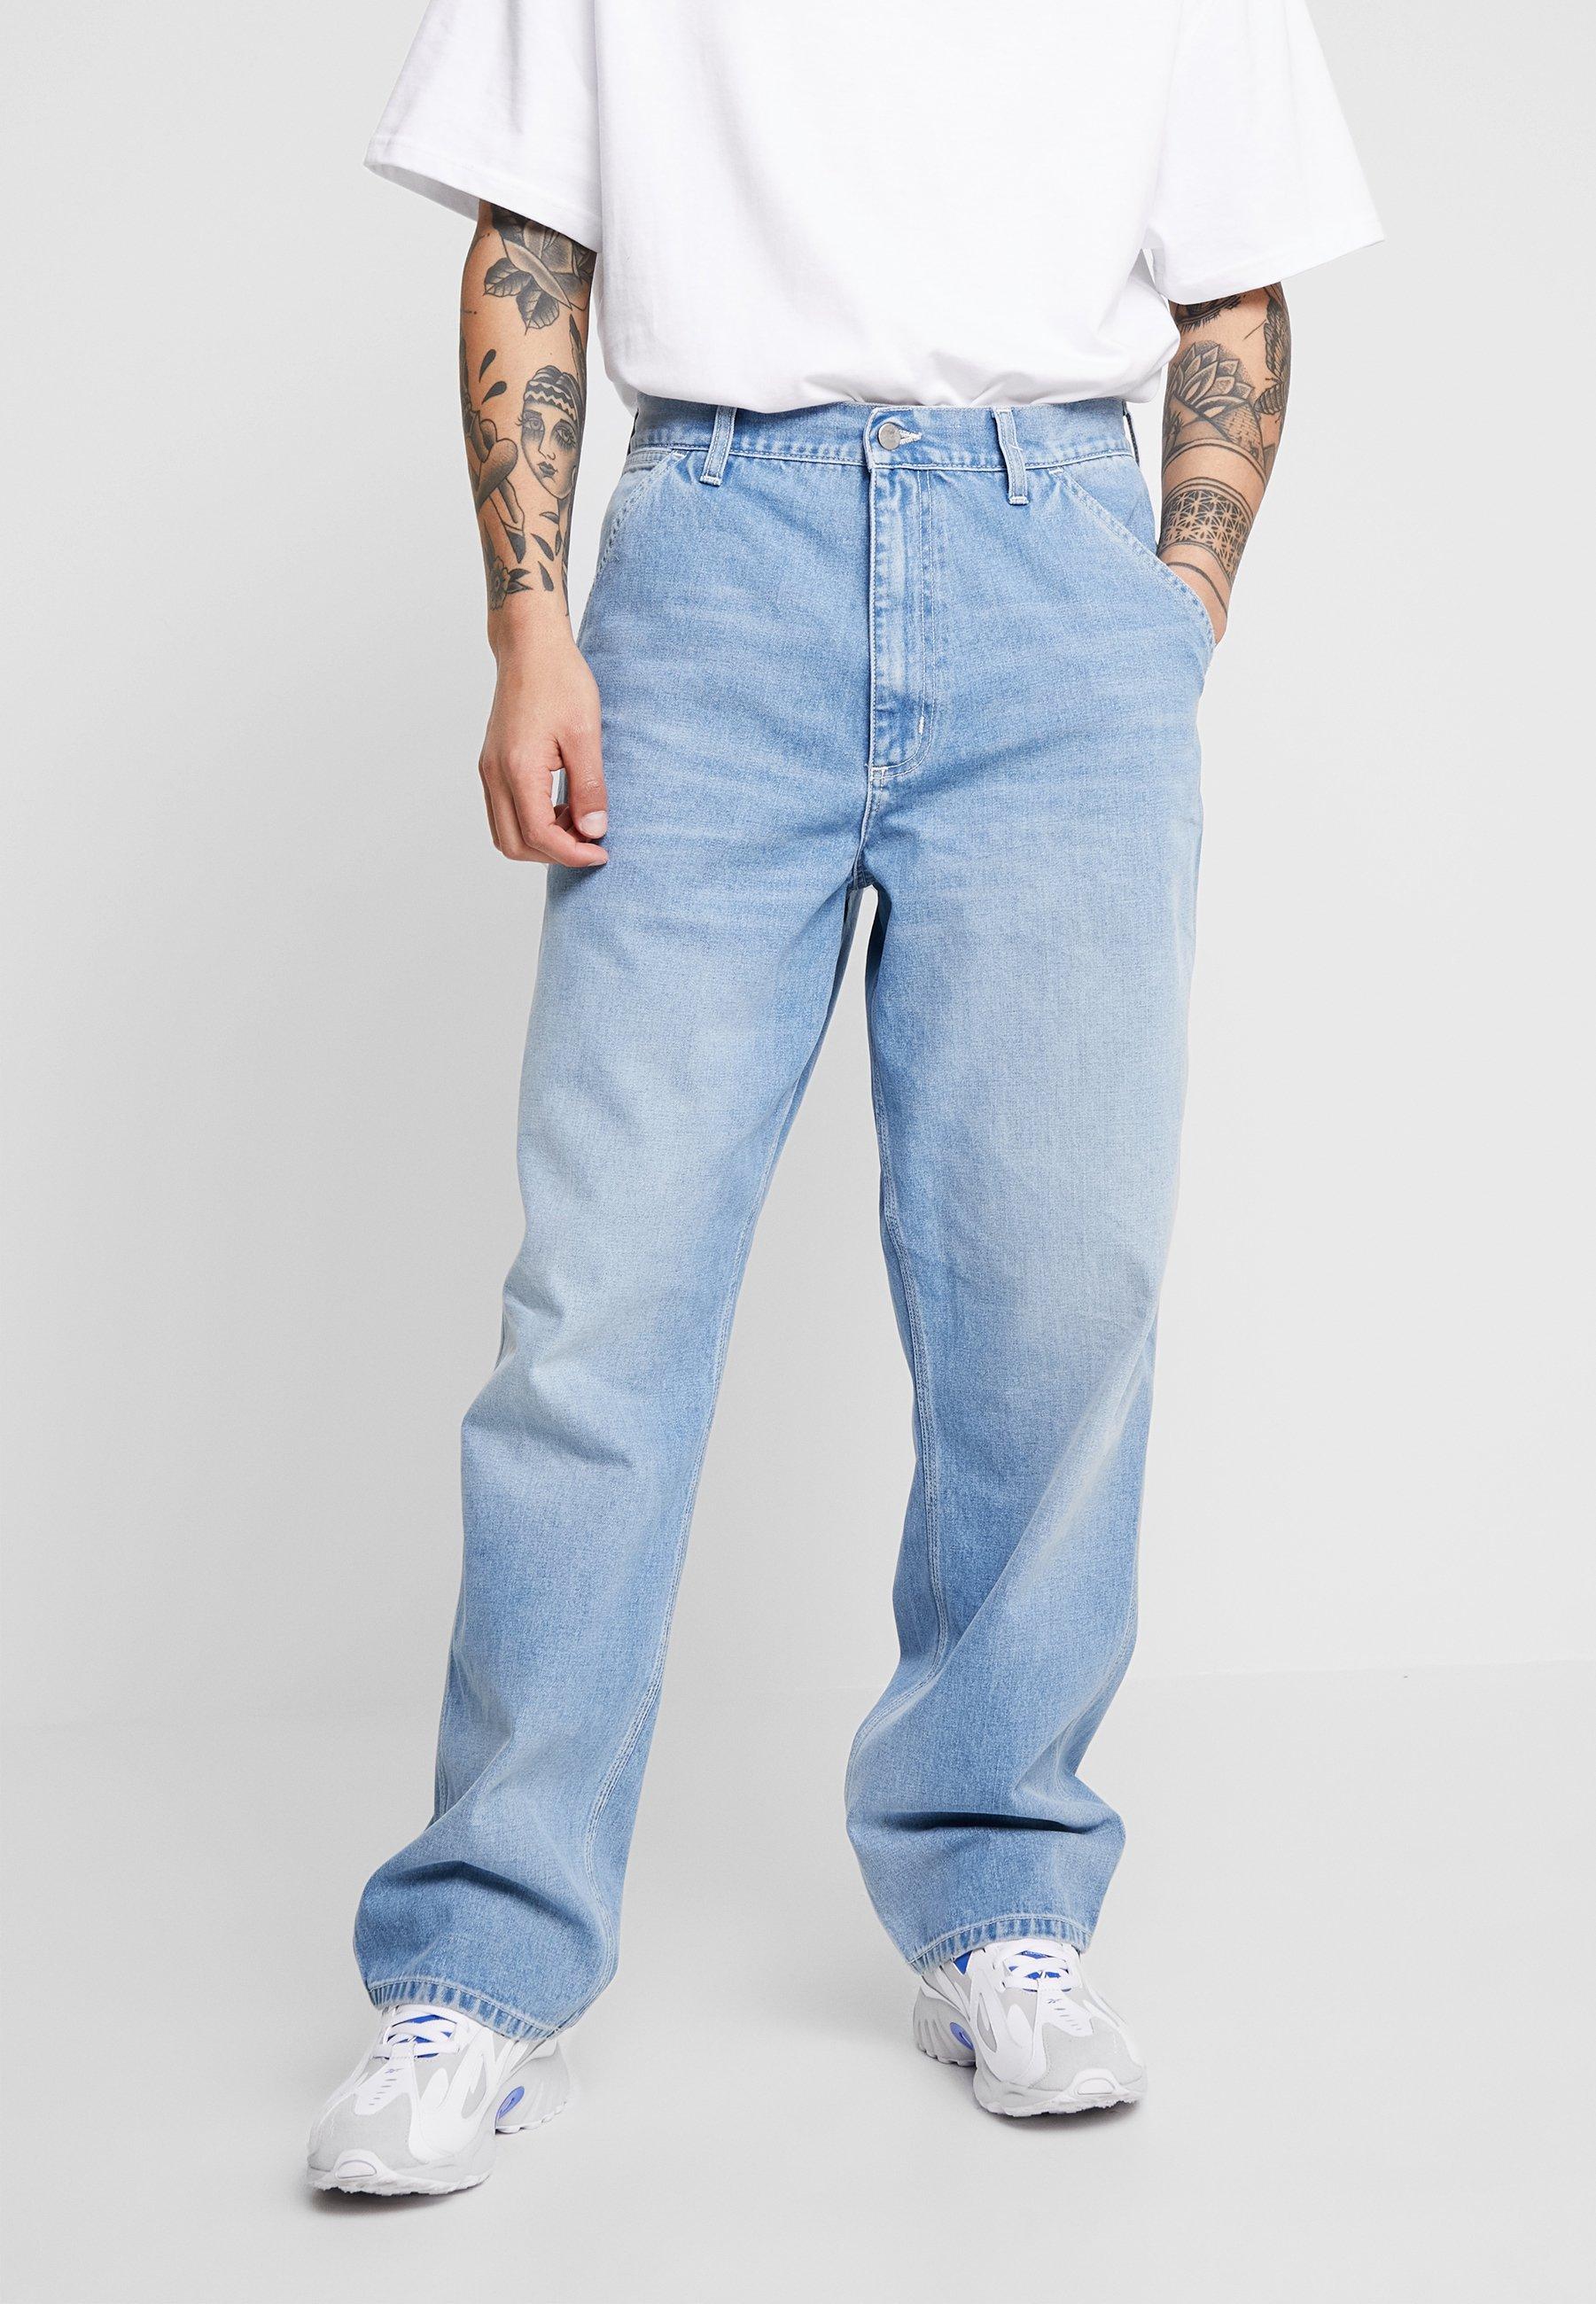 Boyfriend Blue NorcoJean Wip Pant Bleached Simple Carhartt Worn L354RjqA